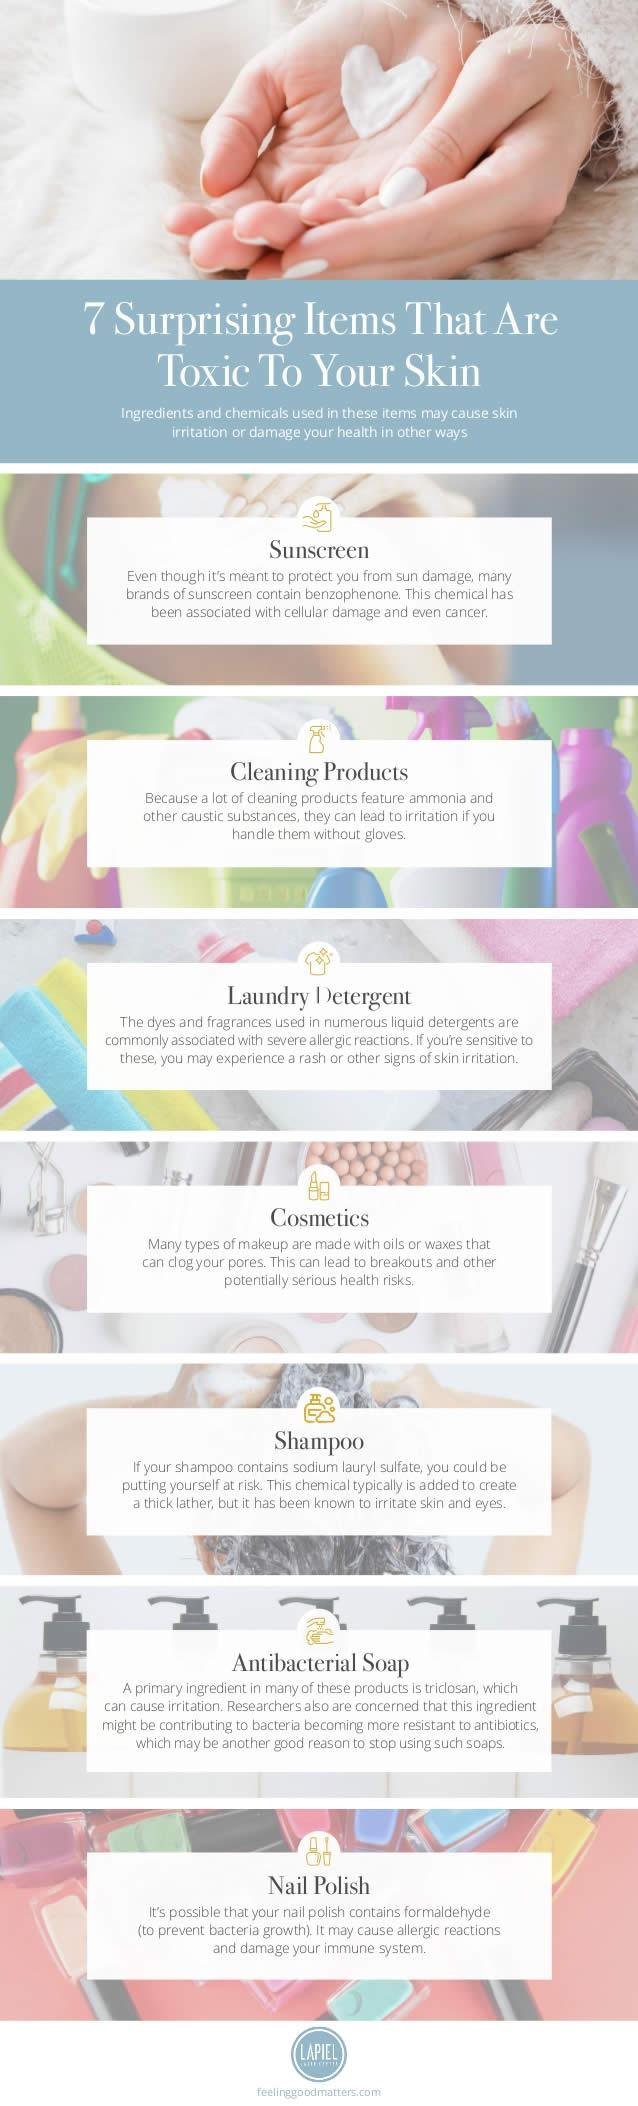 skin toxic items